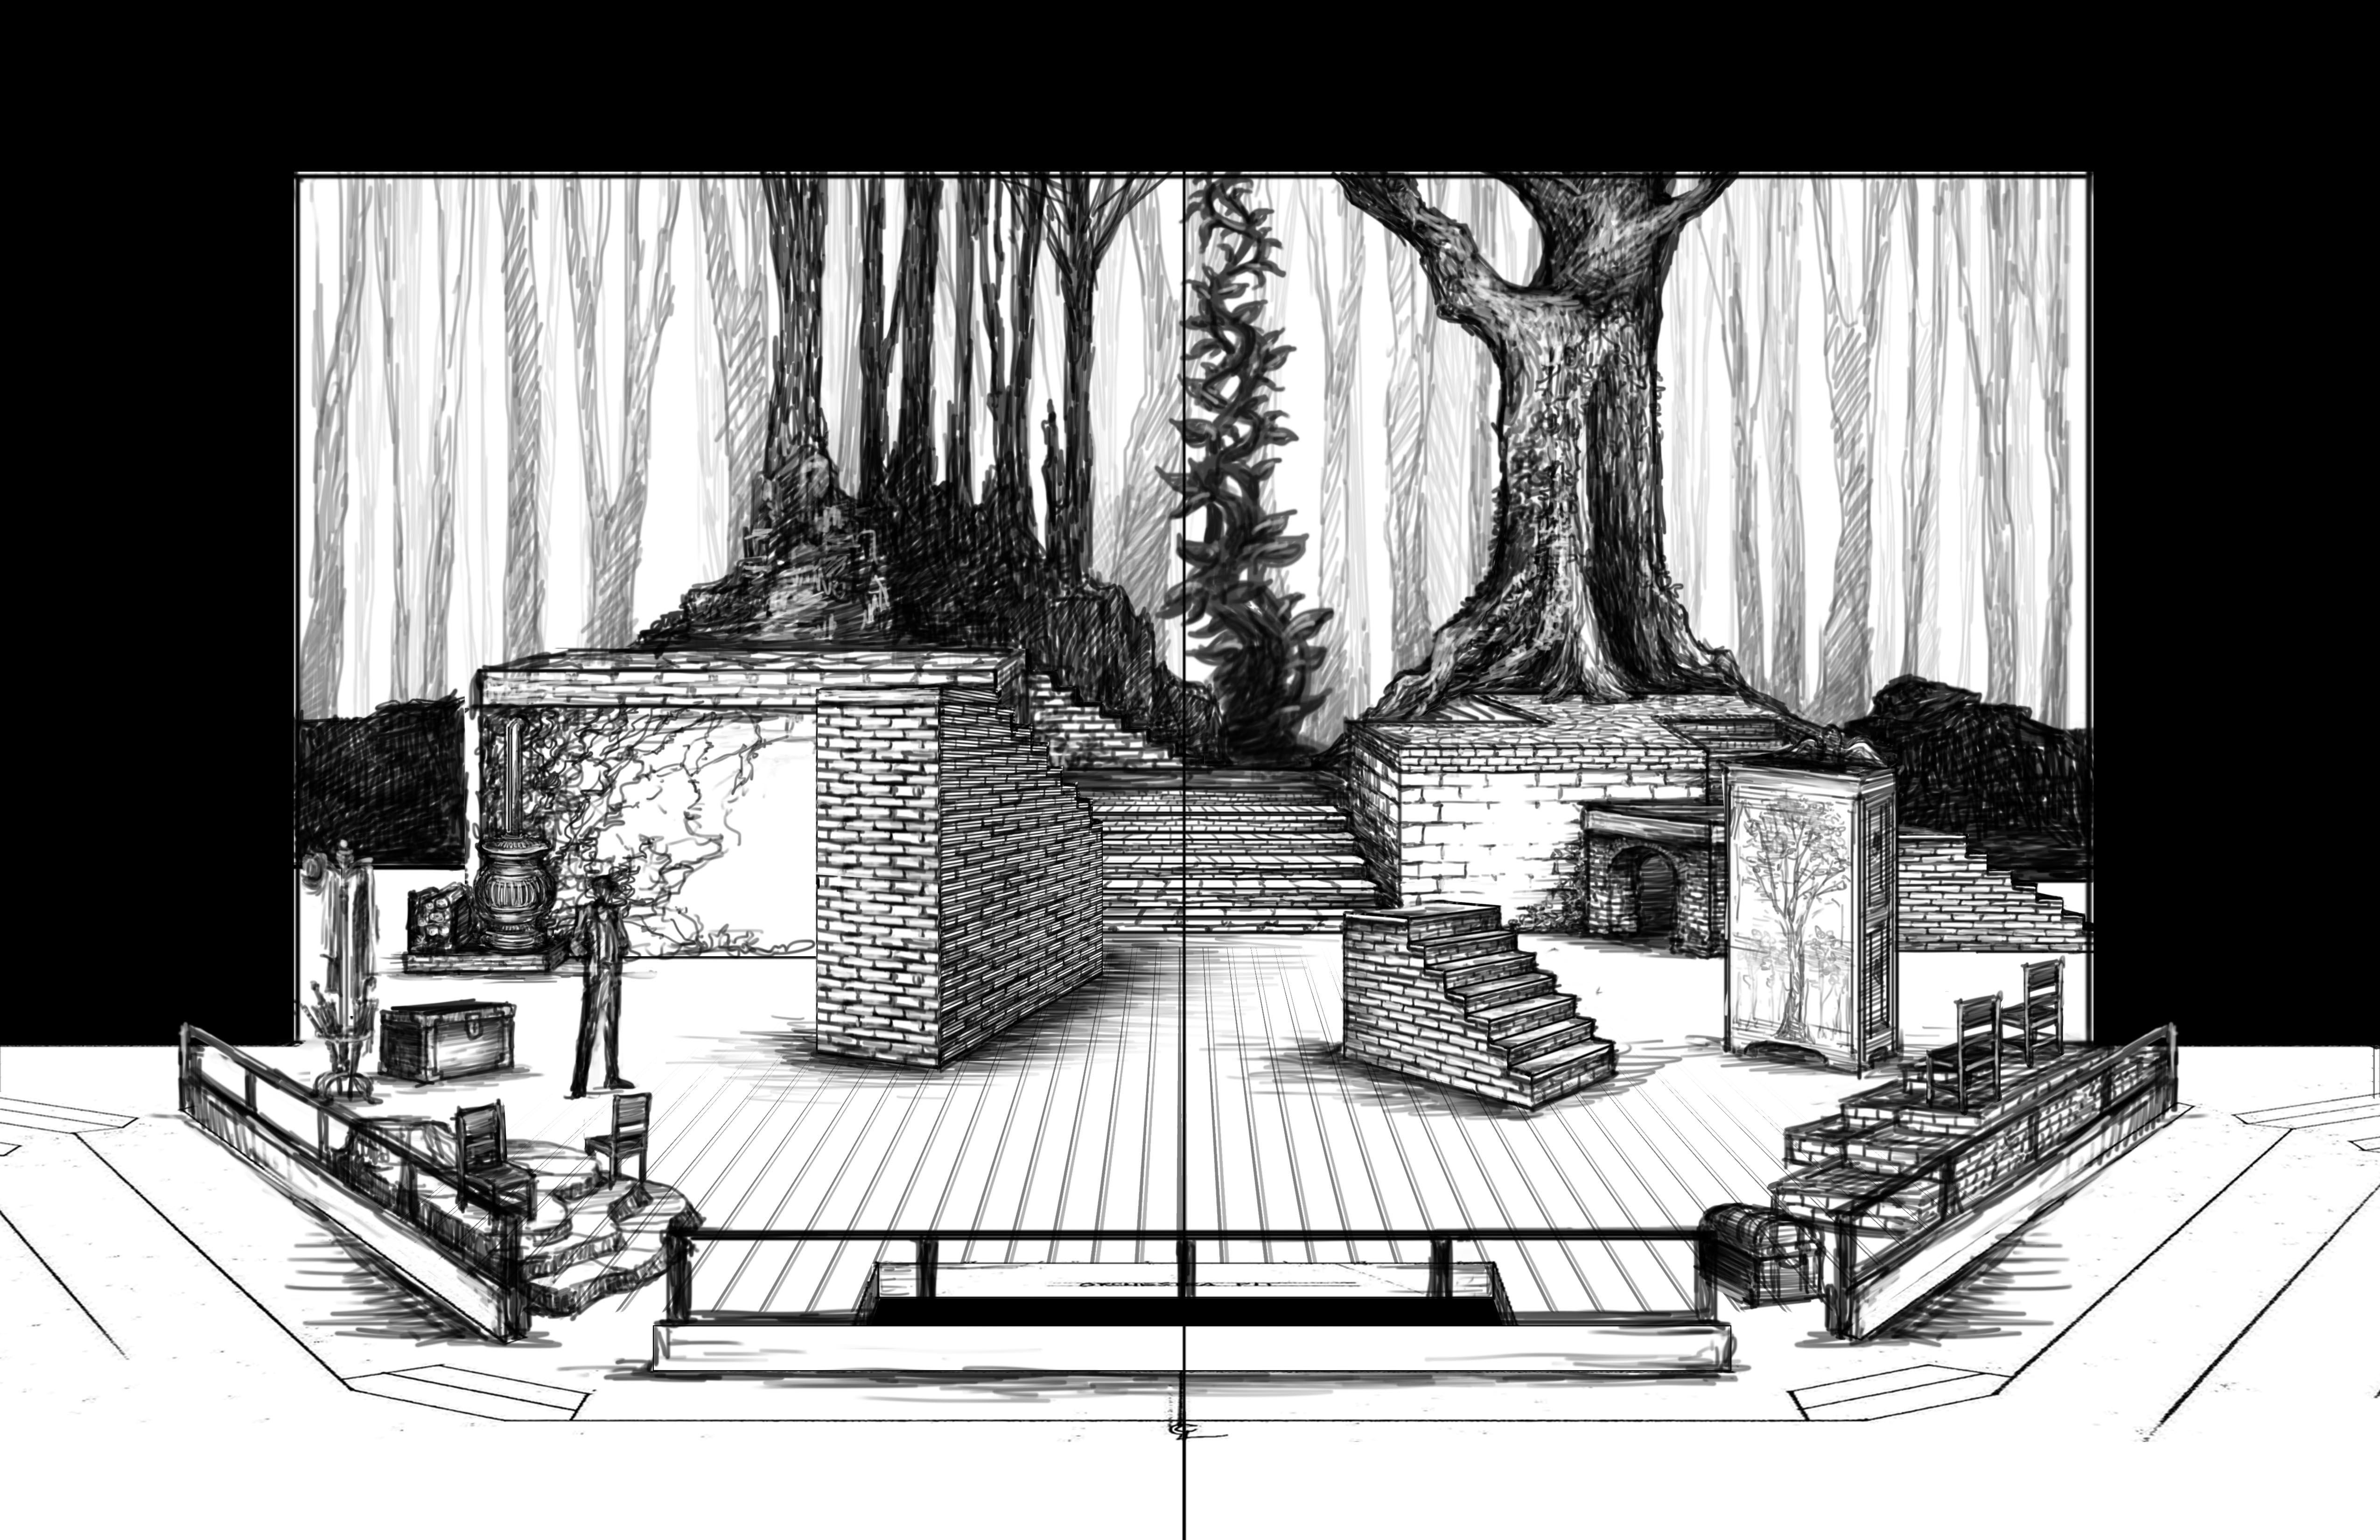 13. The Beanstalk